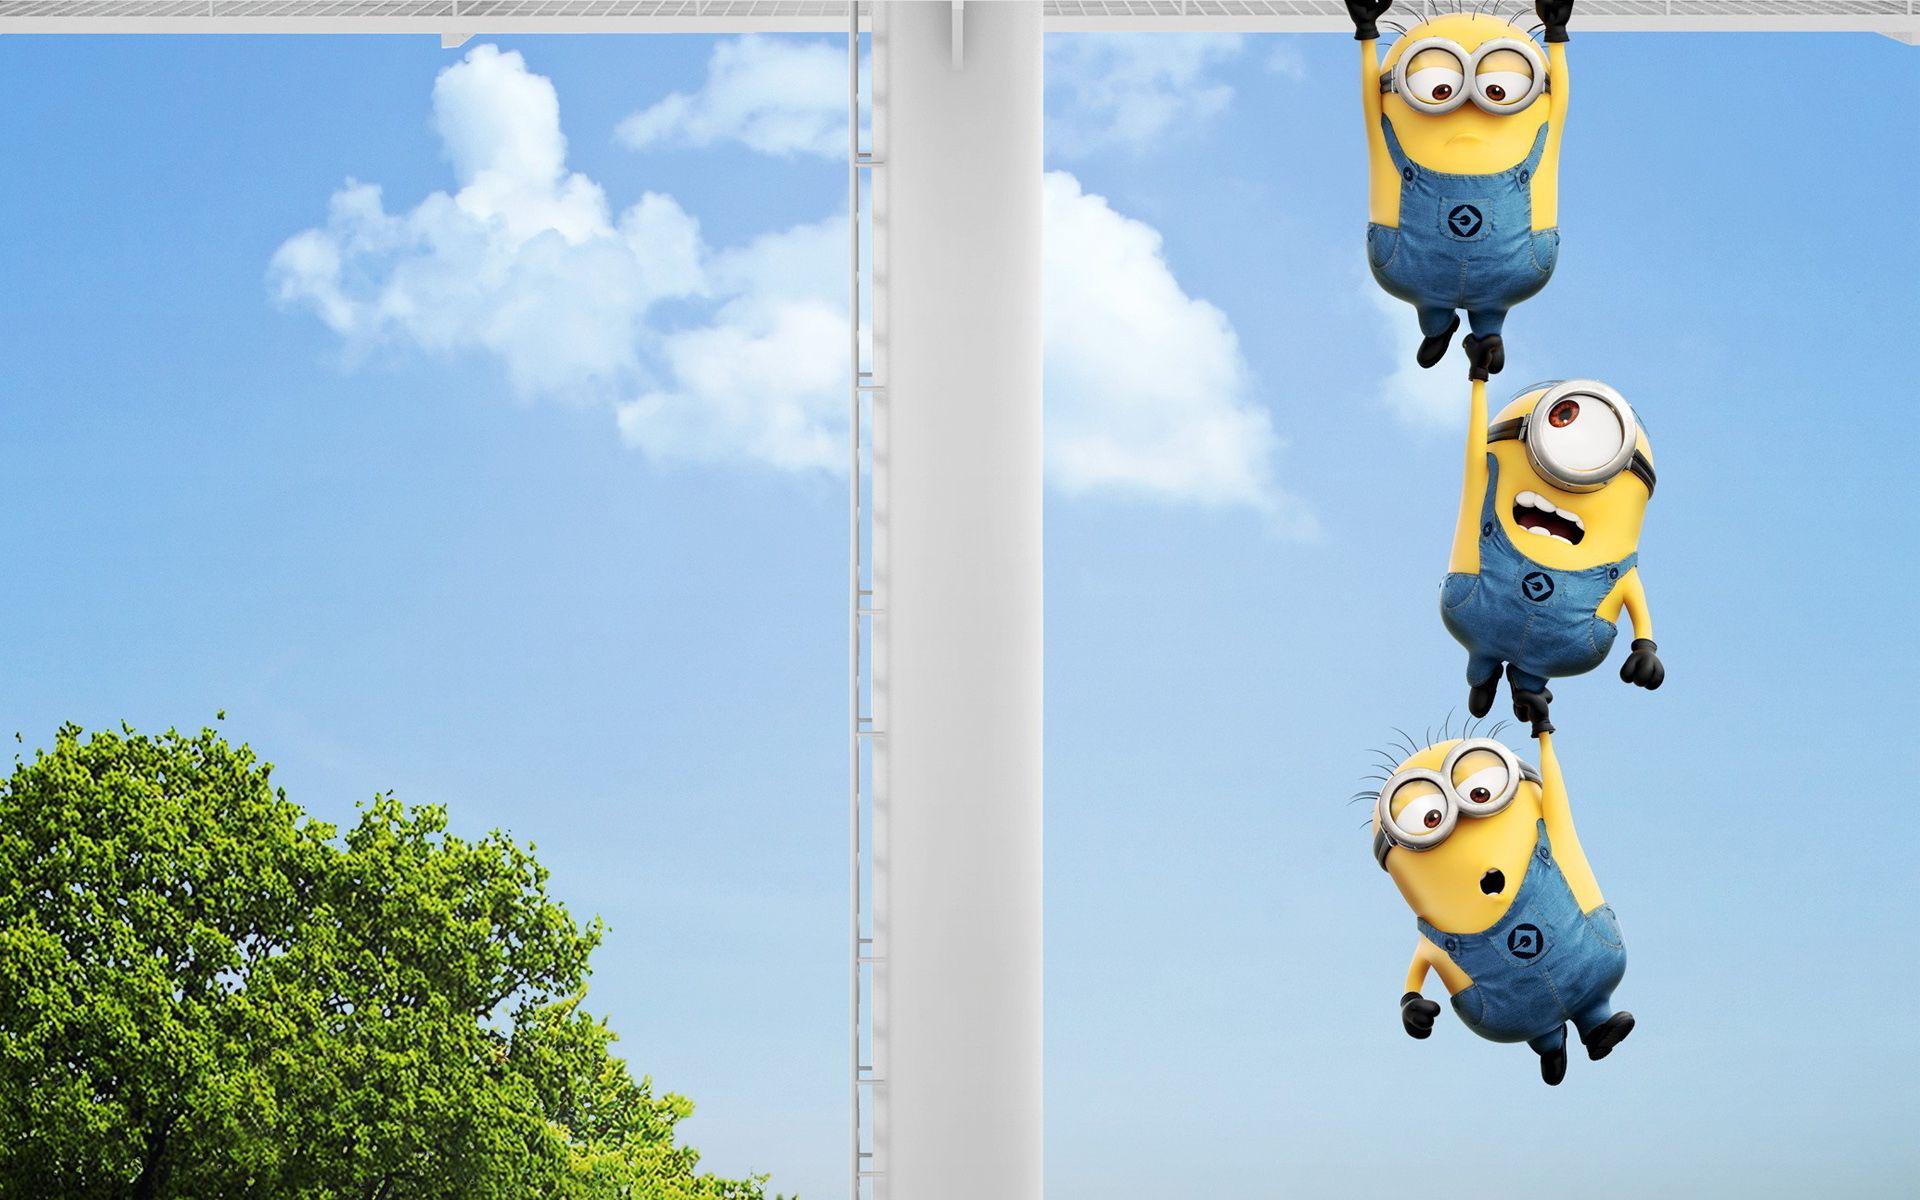 Cute Minions Despicable Me Movie HD Desktop Wallpaper